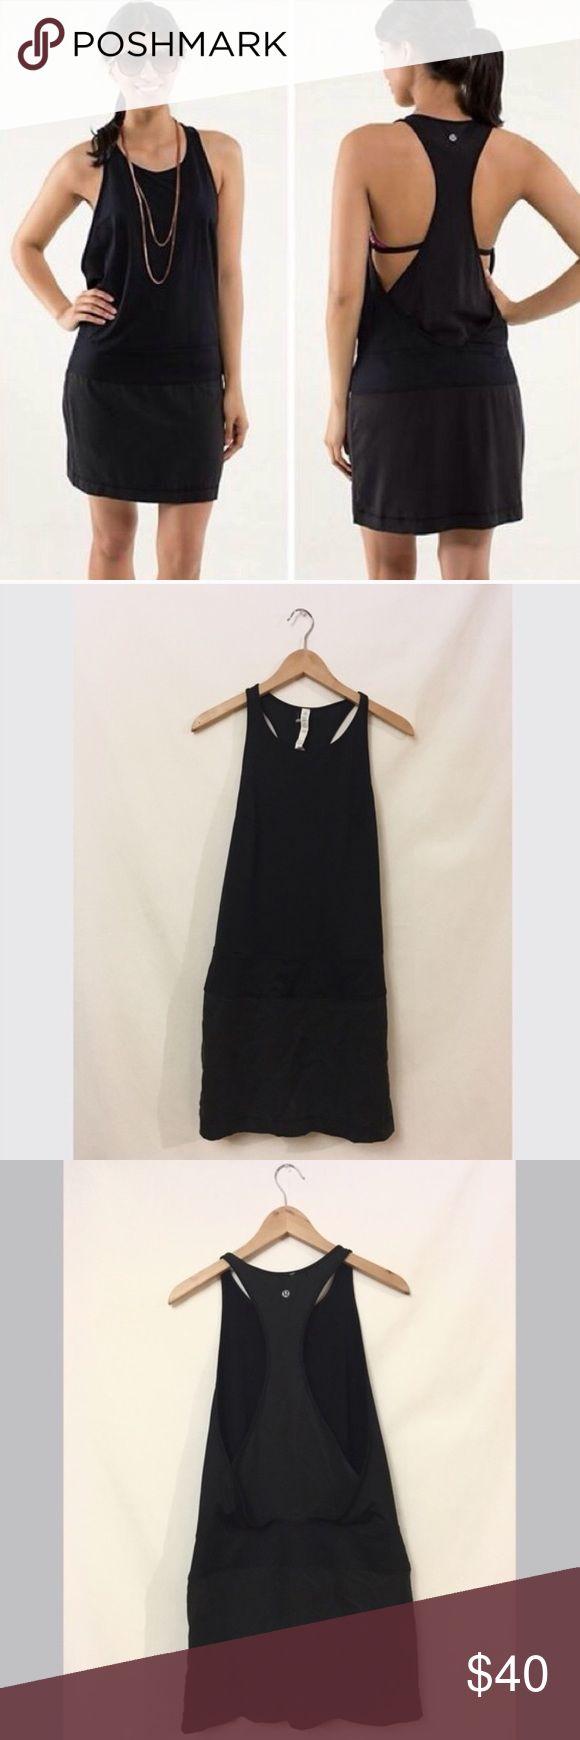 Black lululemon dress Lululemon black casual dress. Gently used condition. Will add a small lululemon recycled tote! :) lululemon athletica Dresses